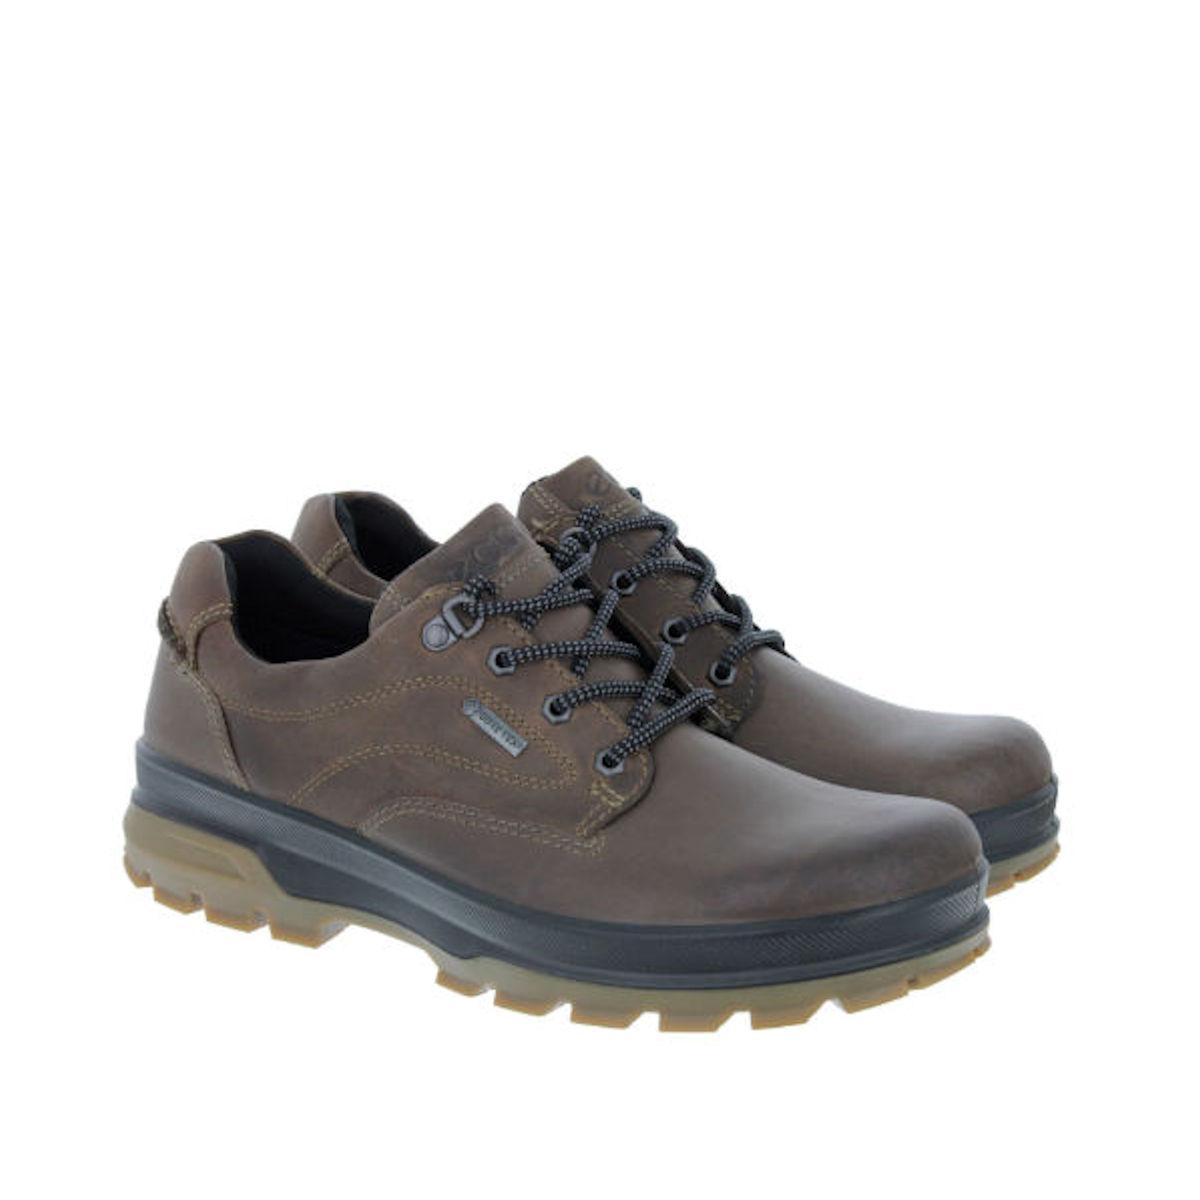 Ecco 838034 Rugged Track Gore-Tex Walking Shoes